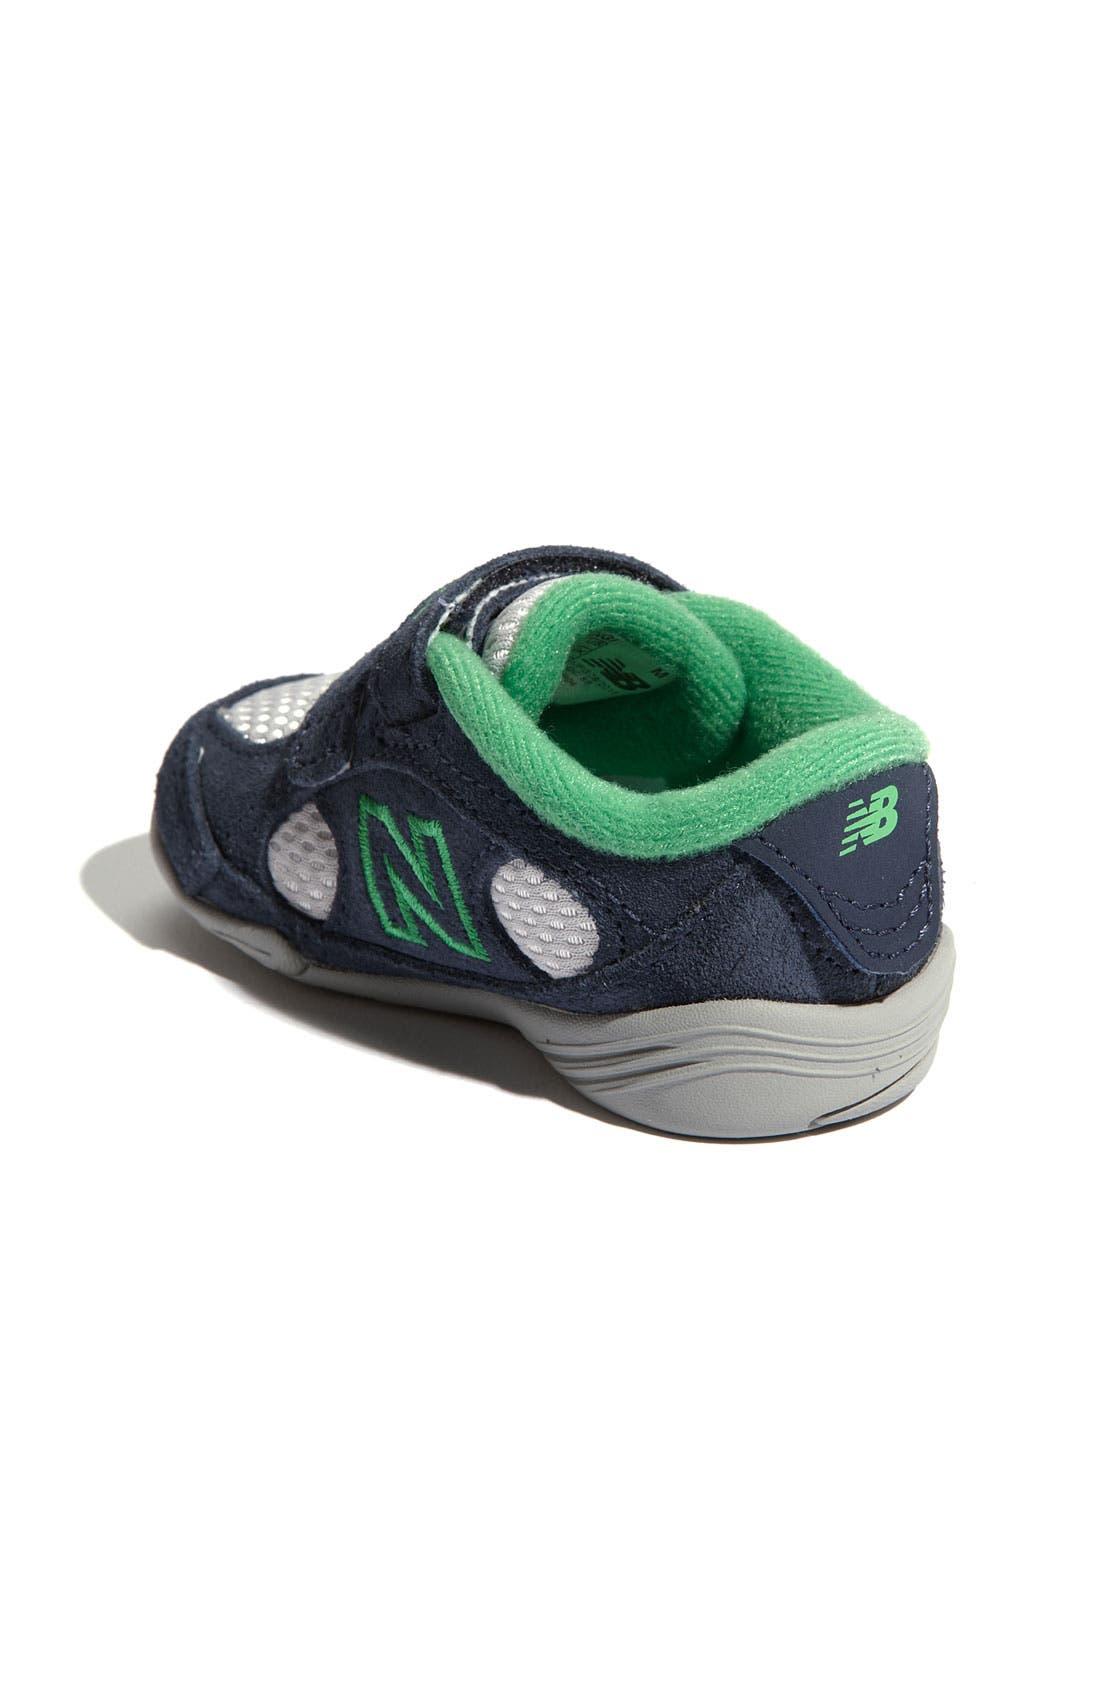 Alternate Image 2  - New Balance '504' Sneaker (Baby, Walker & Toddler)